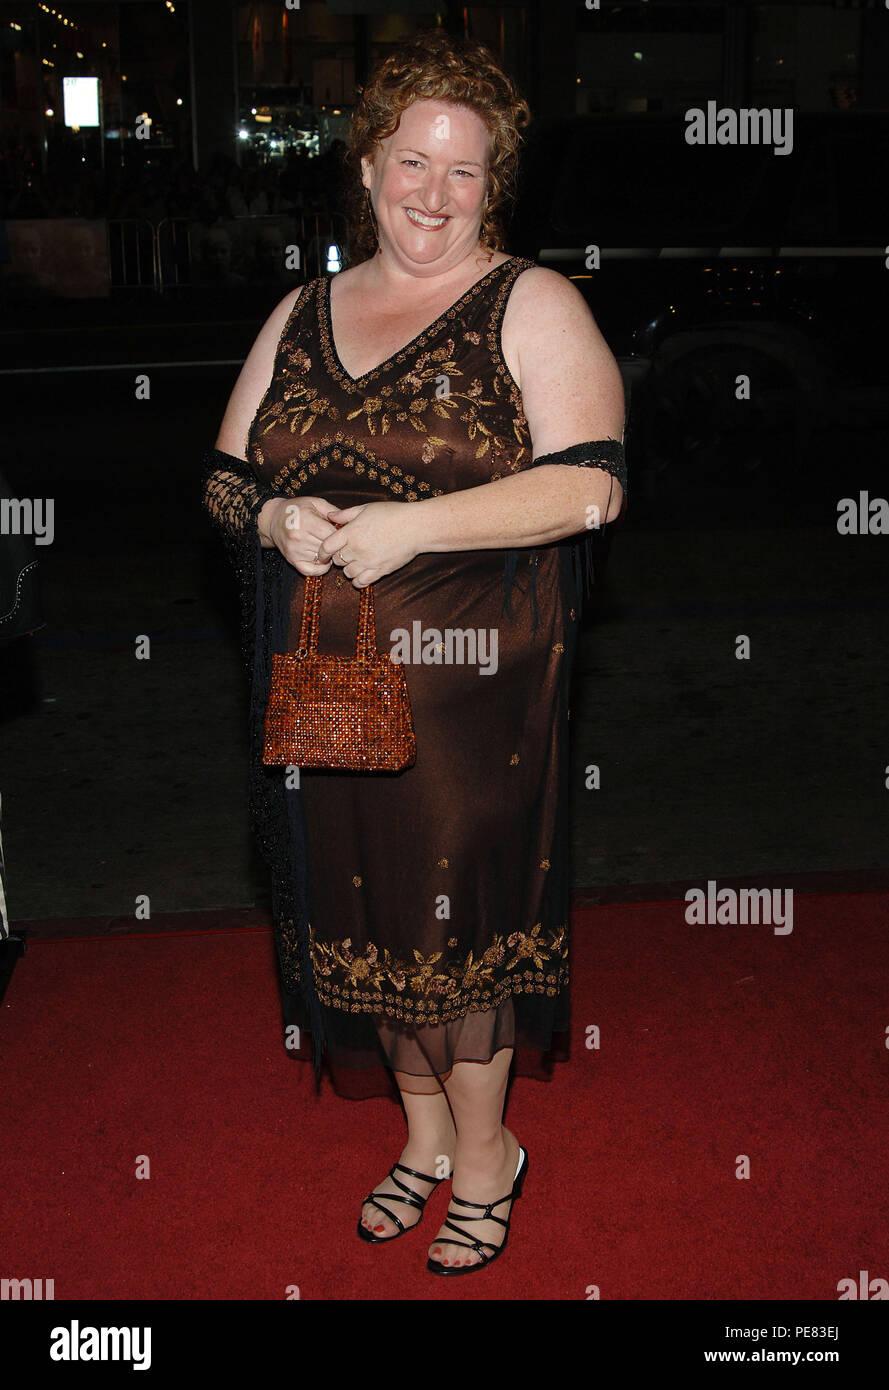 Jenilee Harrison born June 12, 1958 (age 60) Erotic tube Ashley Smith (singer),Melissa Schuman